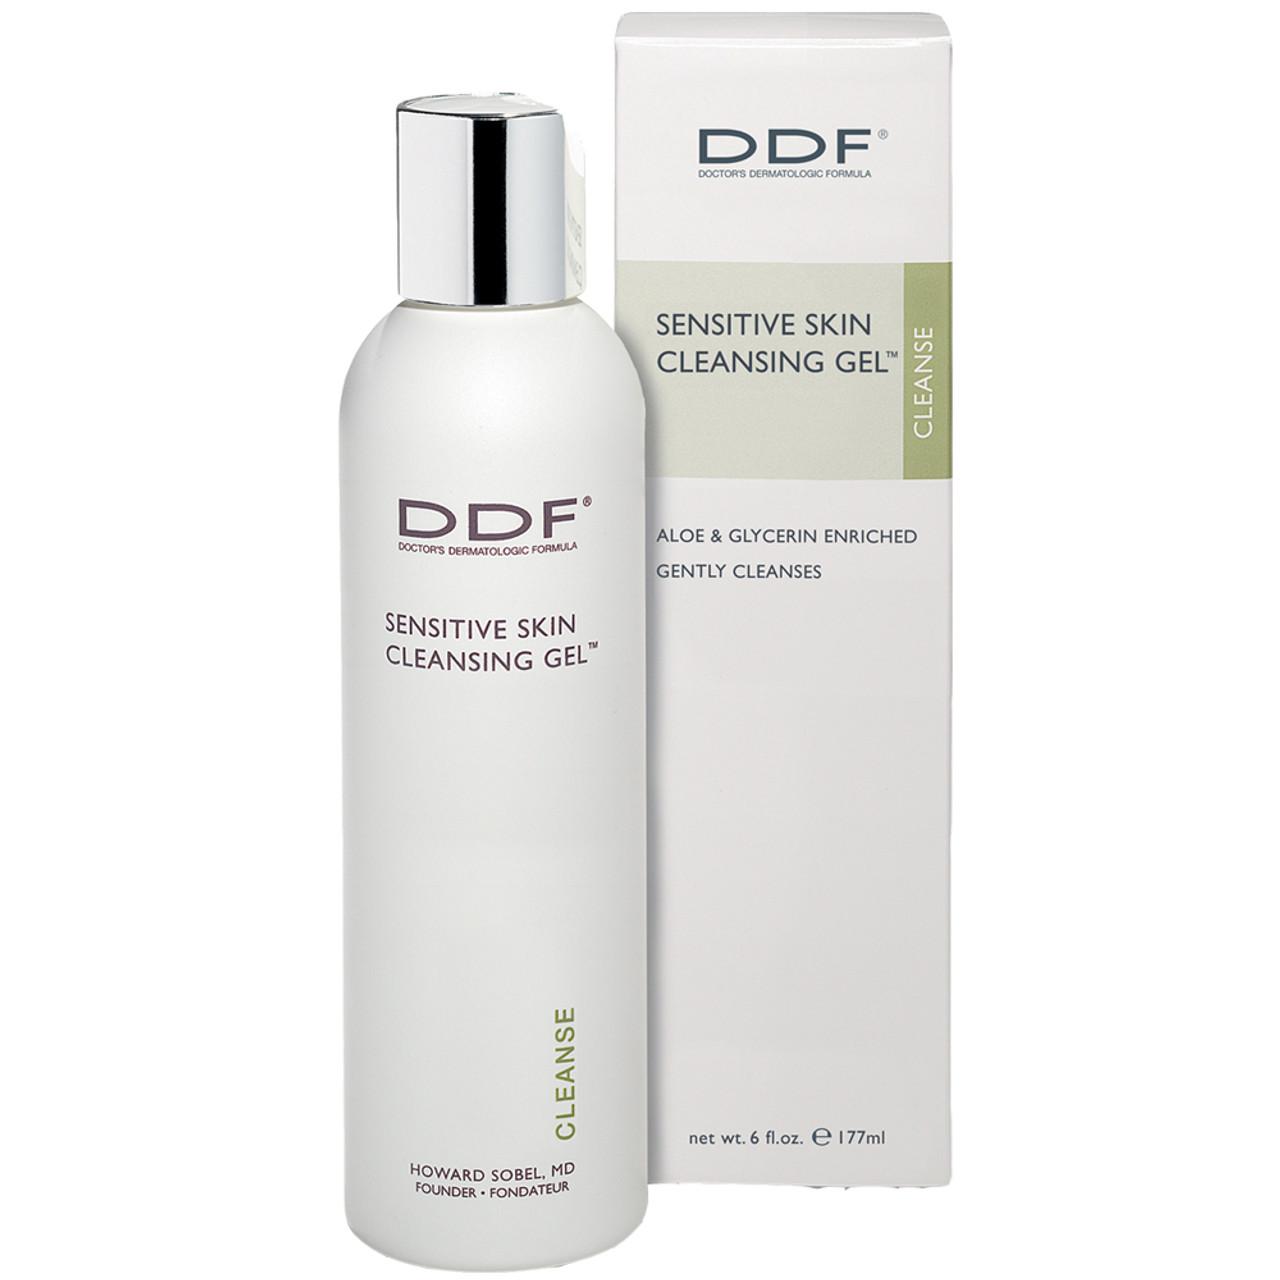 DDF Sensitive Skin Cleansing Gel BeautifiedYou.com